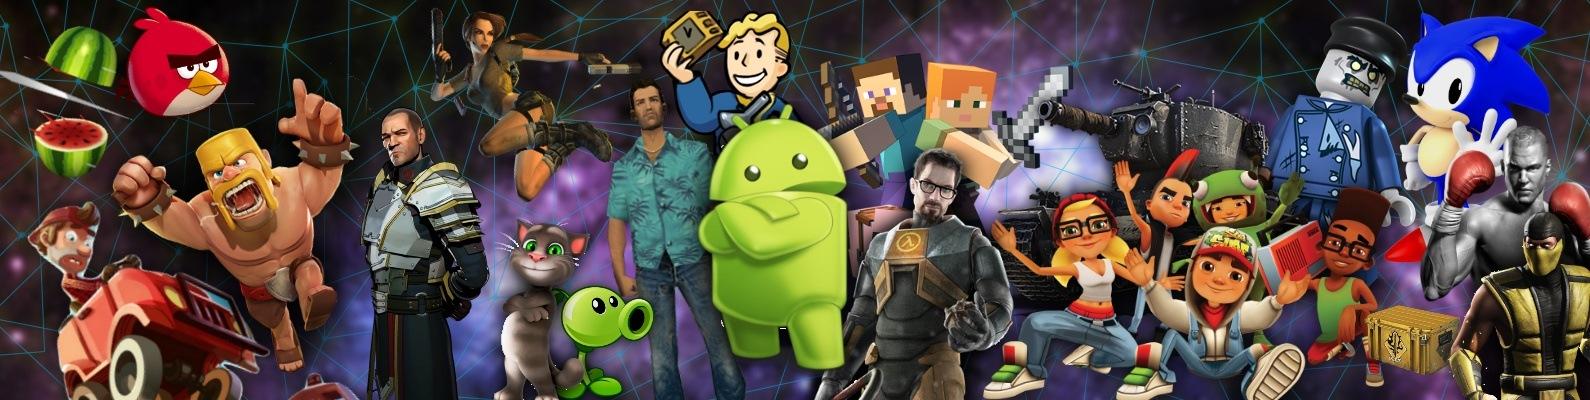 4Android - игры для Андроид - Home | Facebook